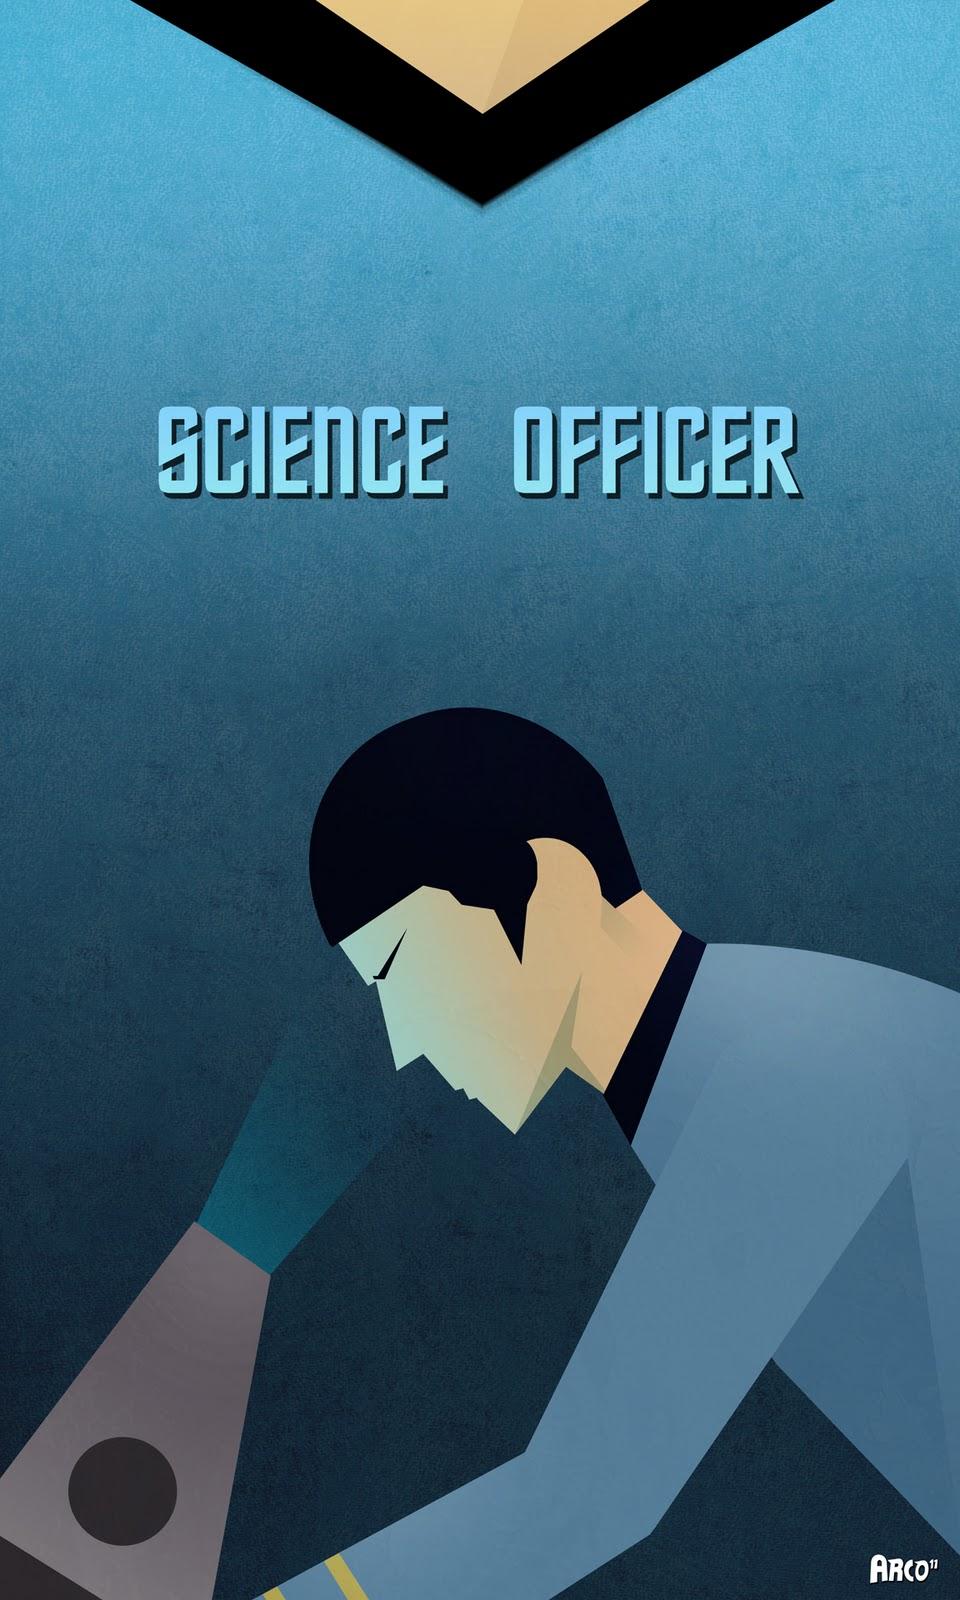 spock star trek nerdpai